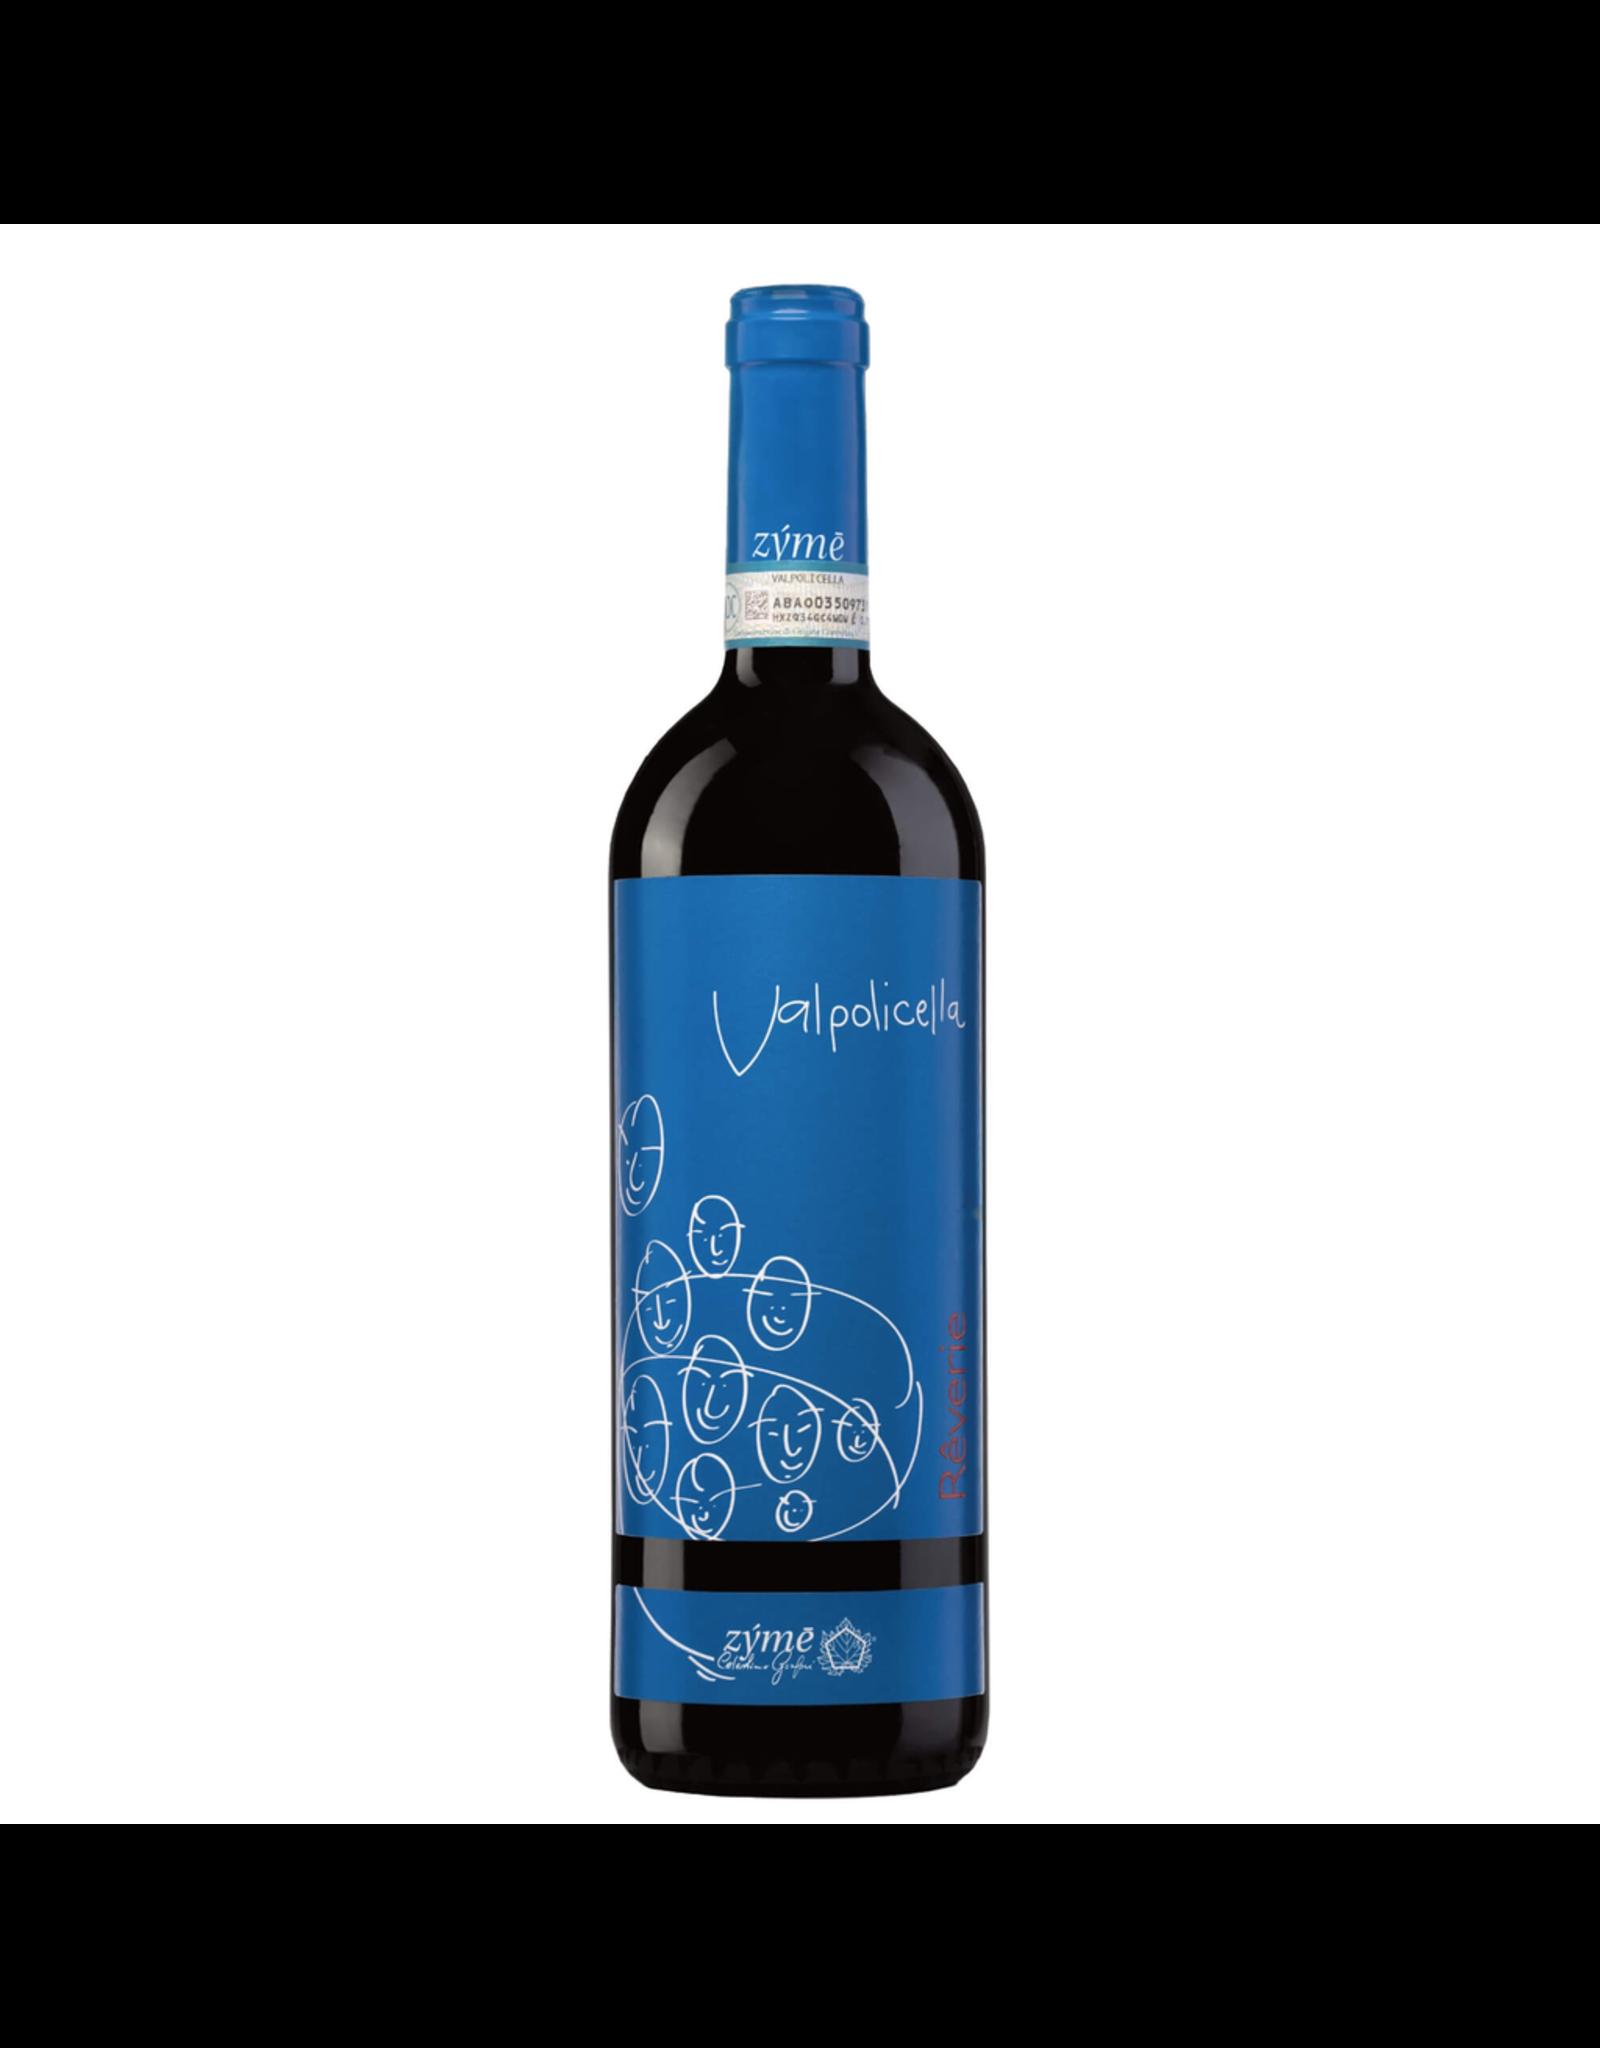 Red Wine 2016, Zyme Valpolicella DOG Reverie, Red Blend, Valpolicella, Veneto, Italy, 11.5% Alc, CT